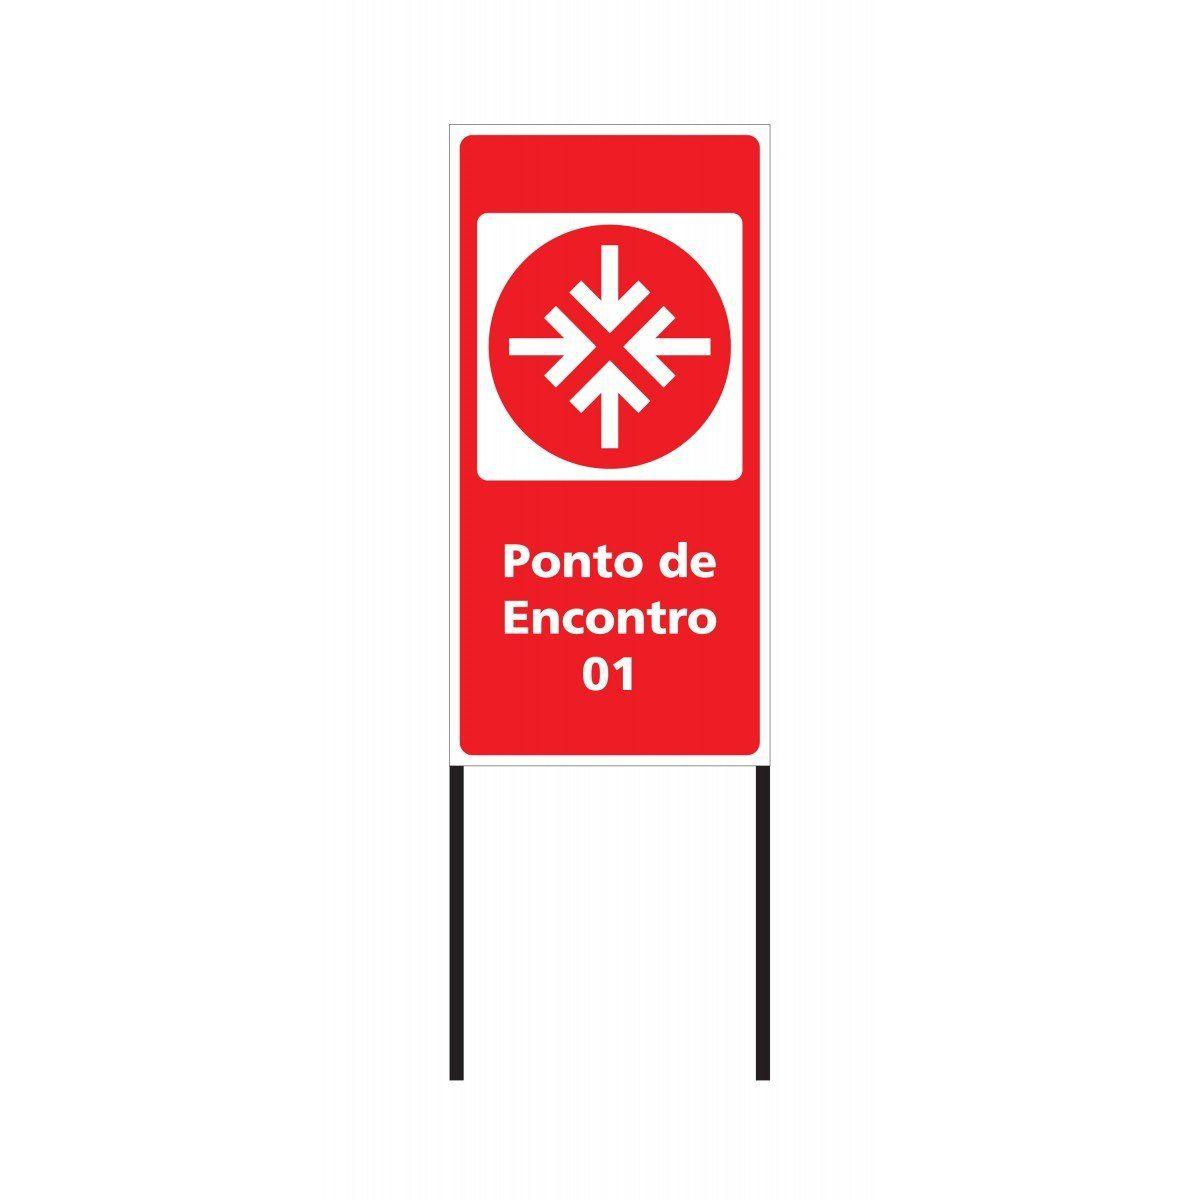 Placa Ponto de Encontro 75x150 cm - Clace 1 UN